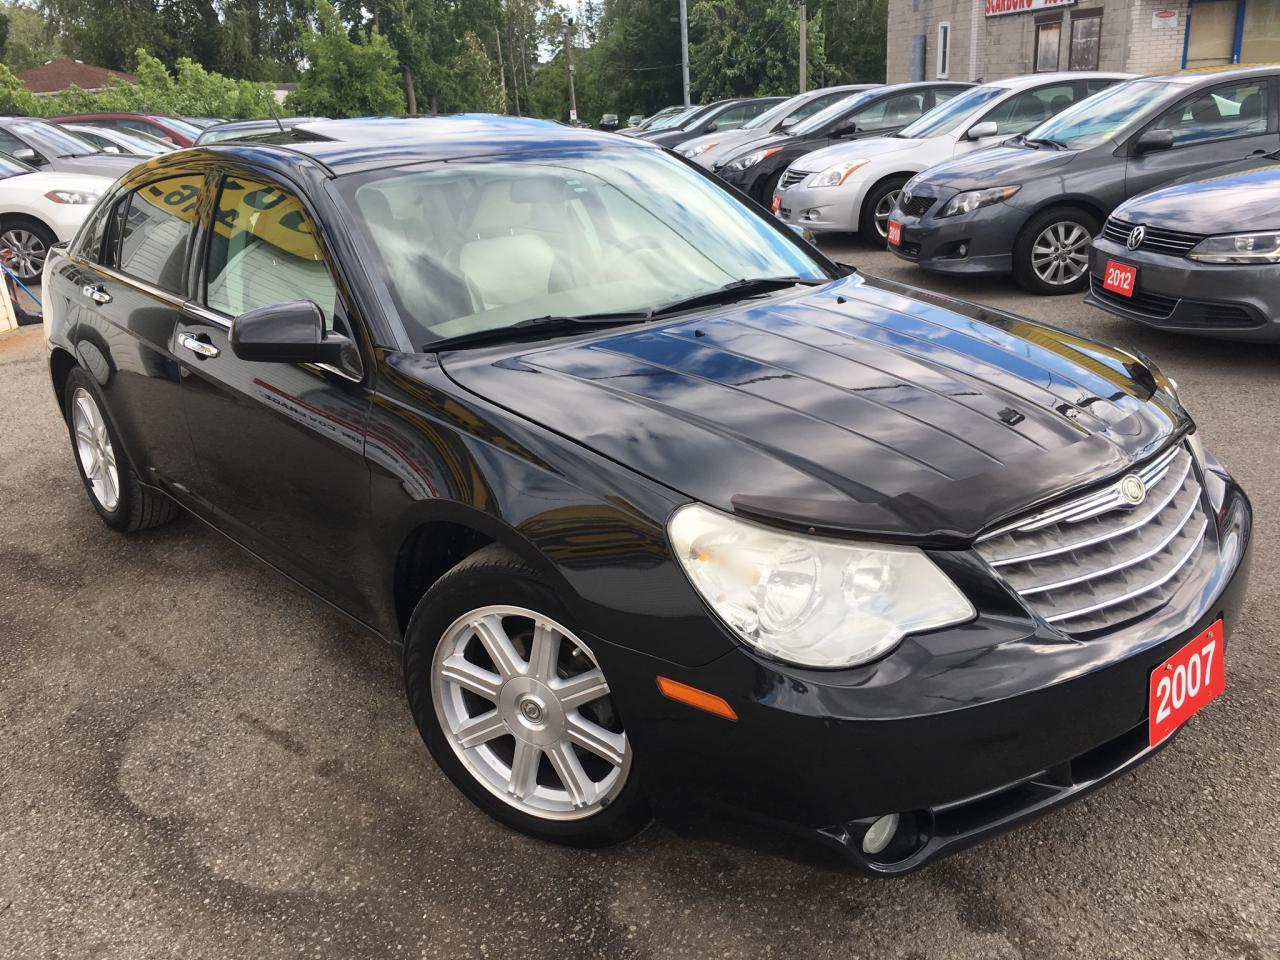 2007 Chrysler Sebring Limited/LEATHER/SUNROOF/ALLOYS/DRIVES LIKENEW